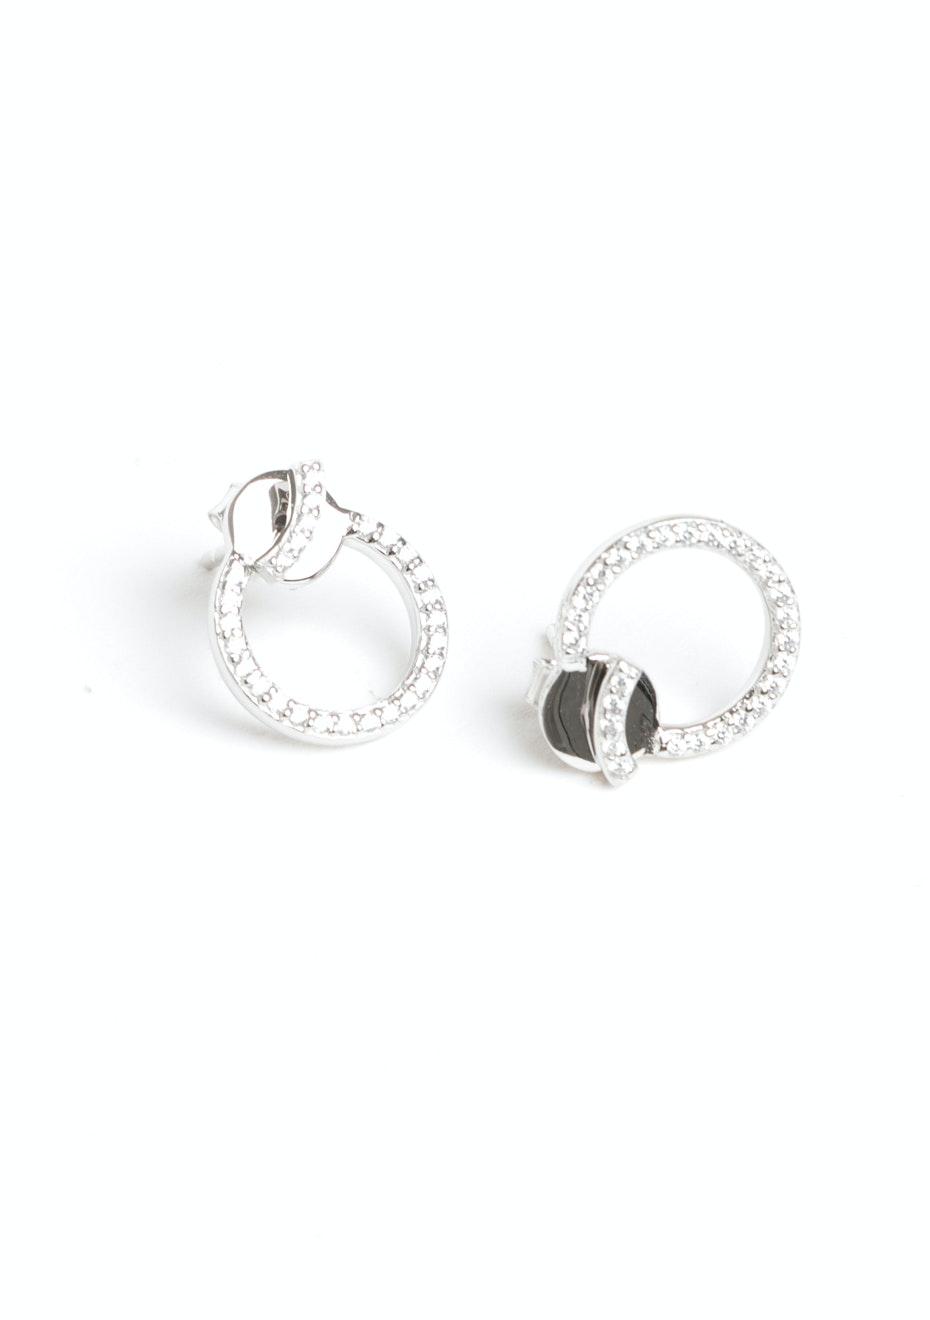 Eternal Circle - 925 Silver